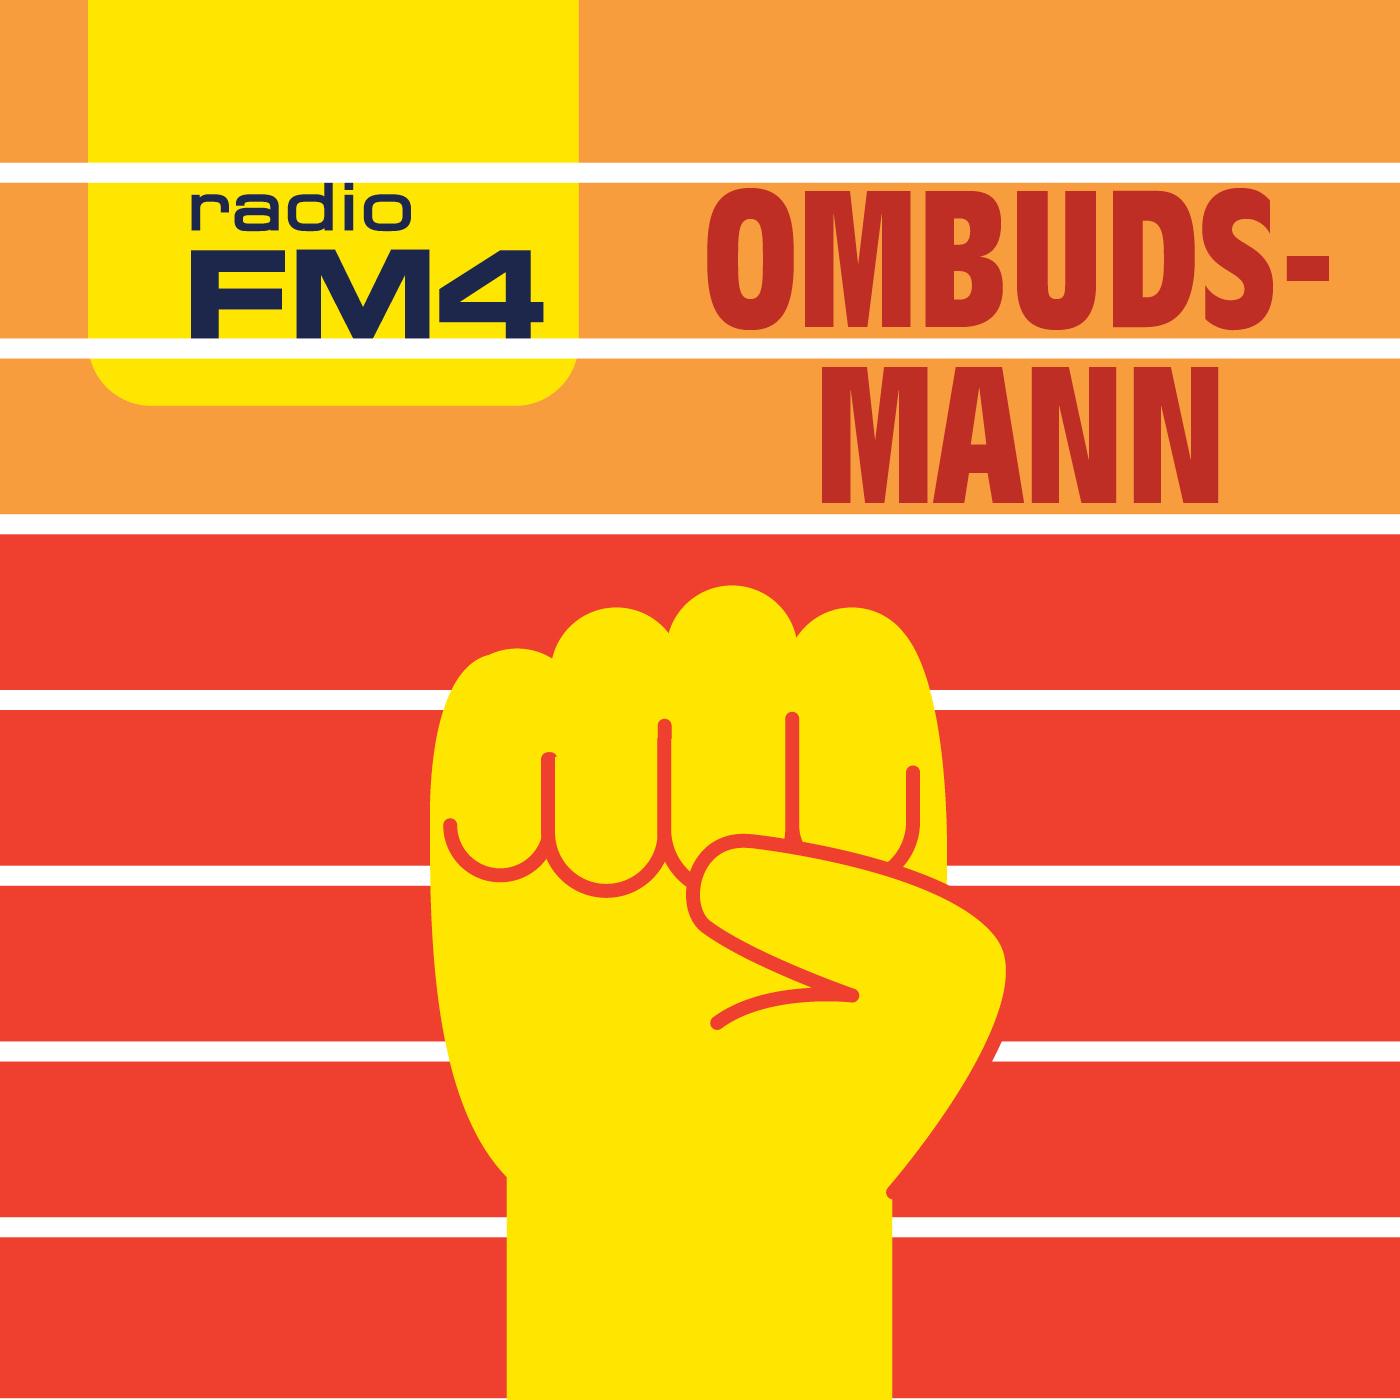 FM4 Ombudsmann